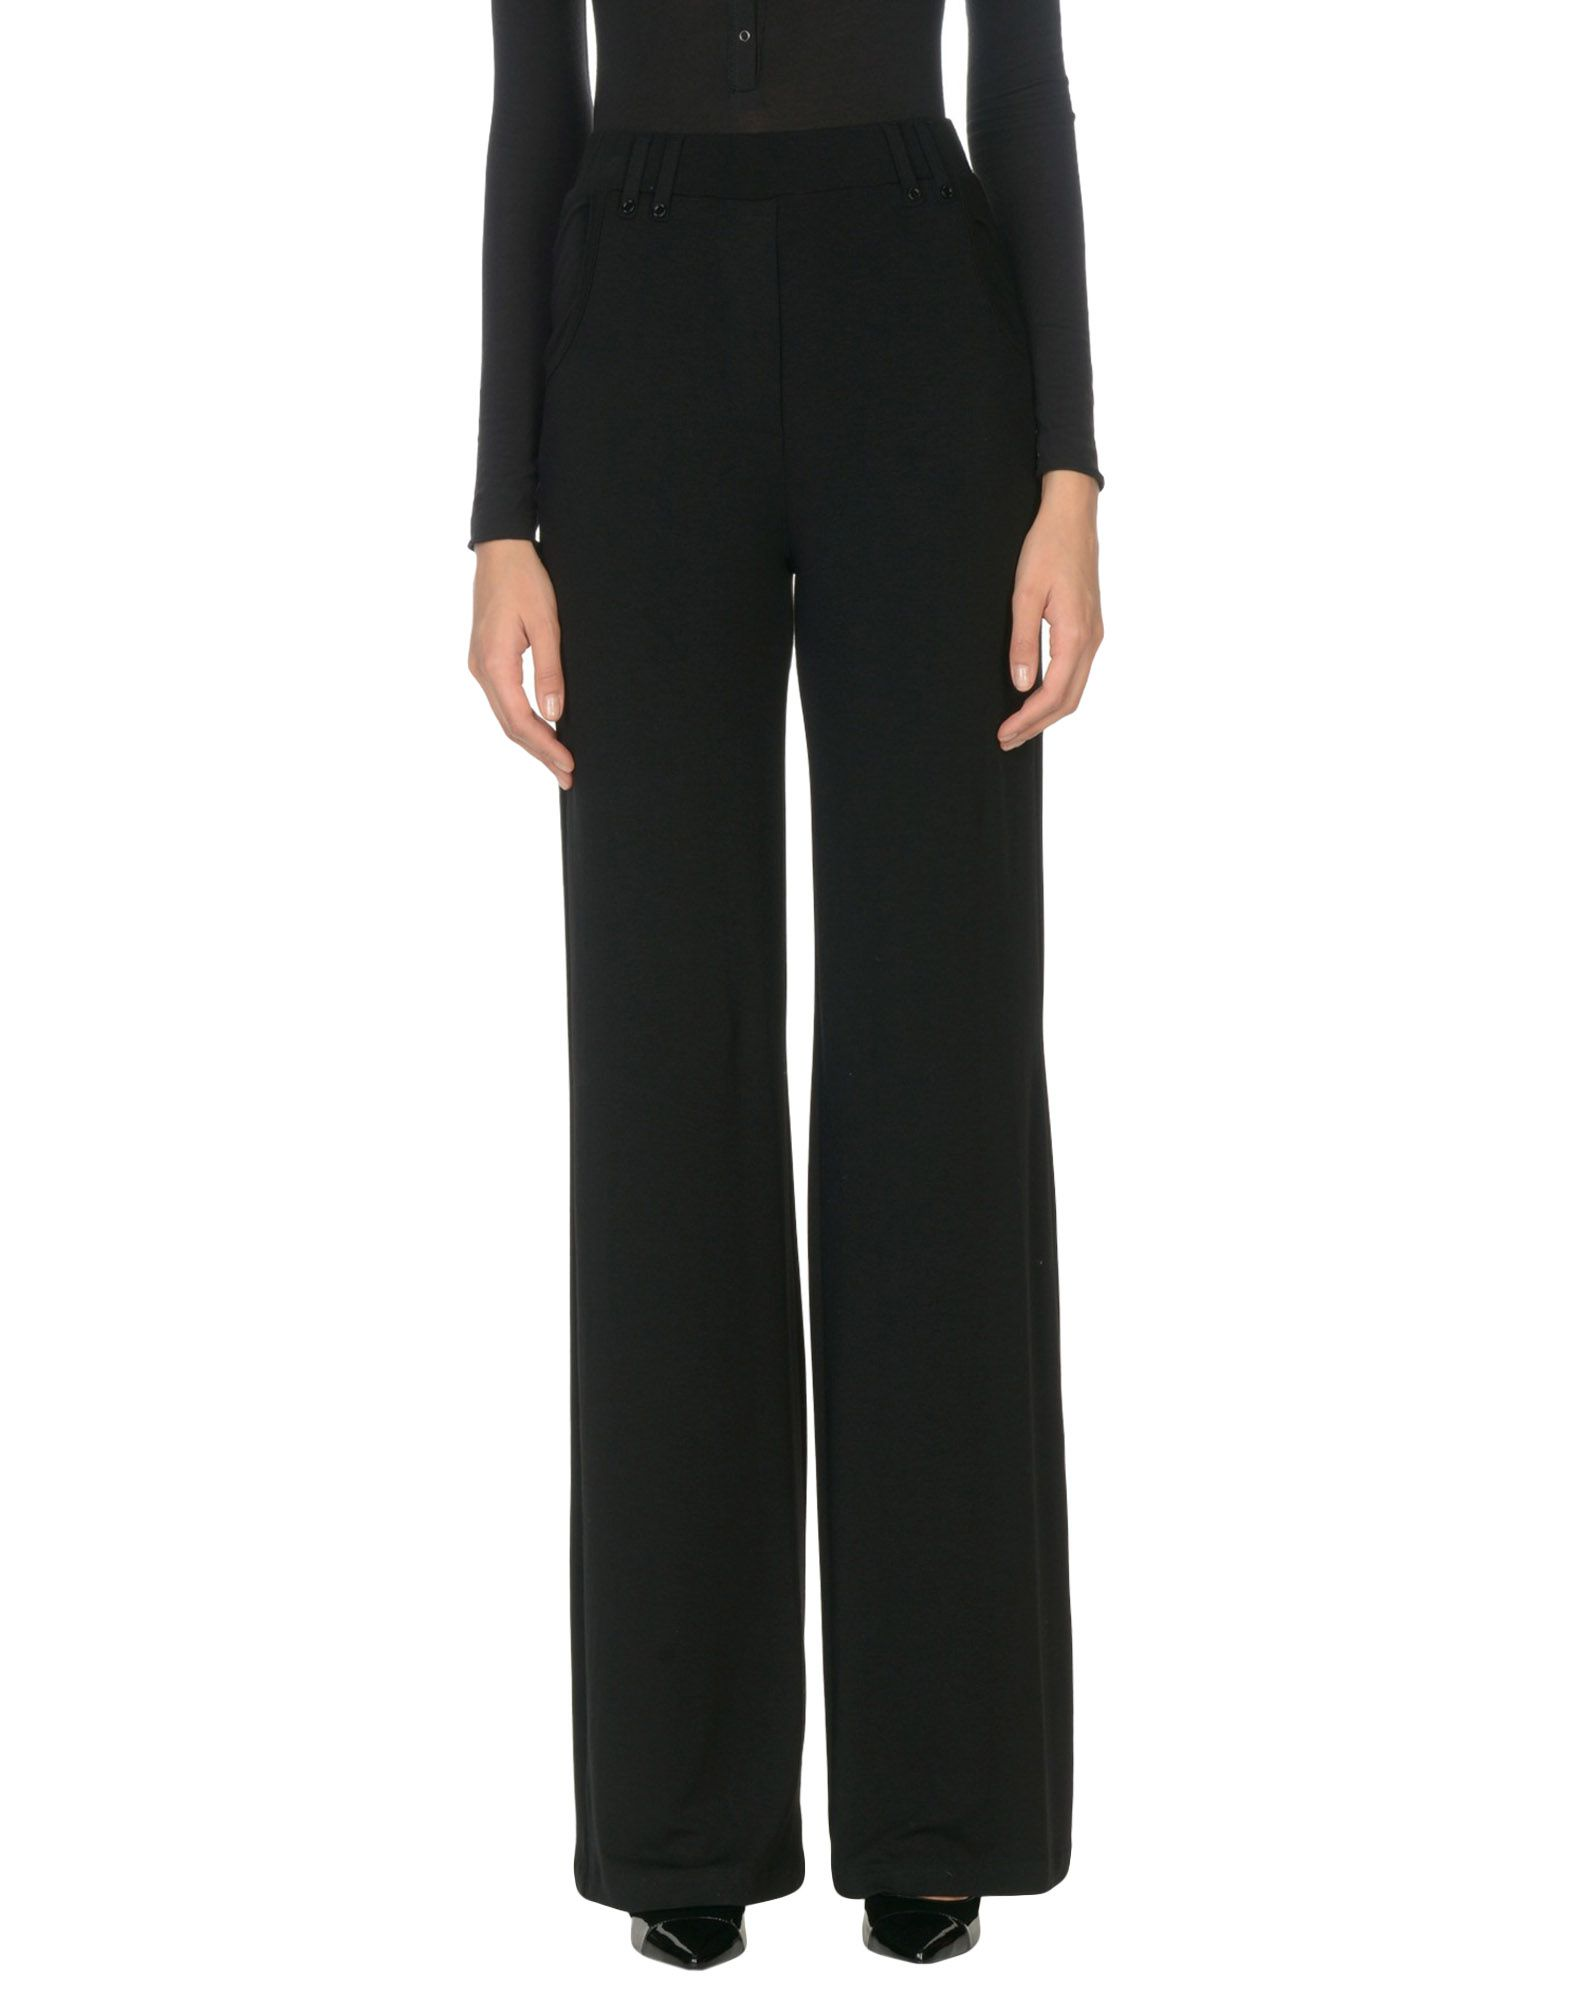 PLEIN SUD JEANIUS Casual Pants in Black